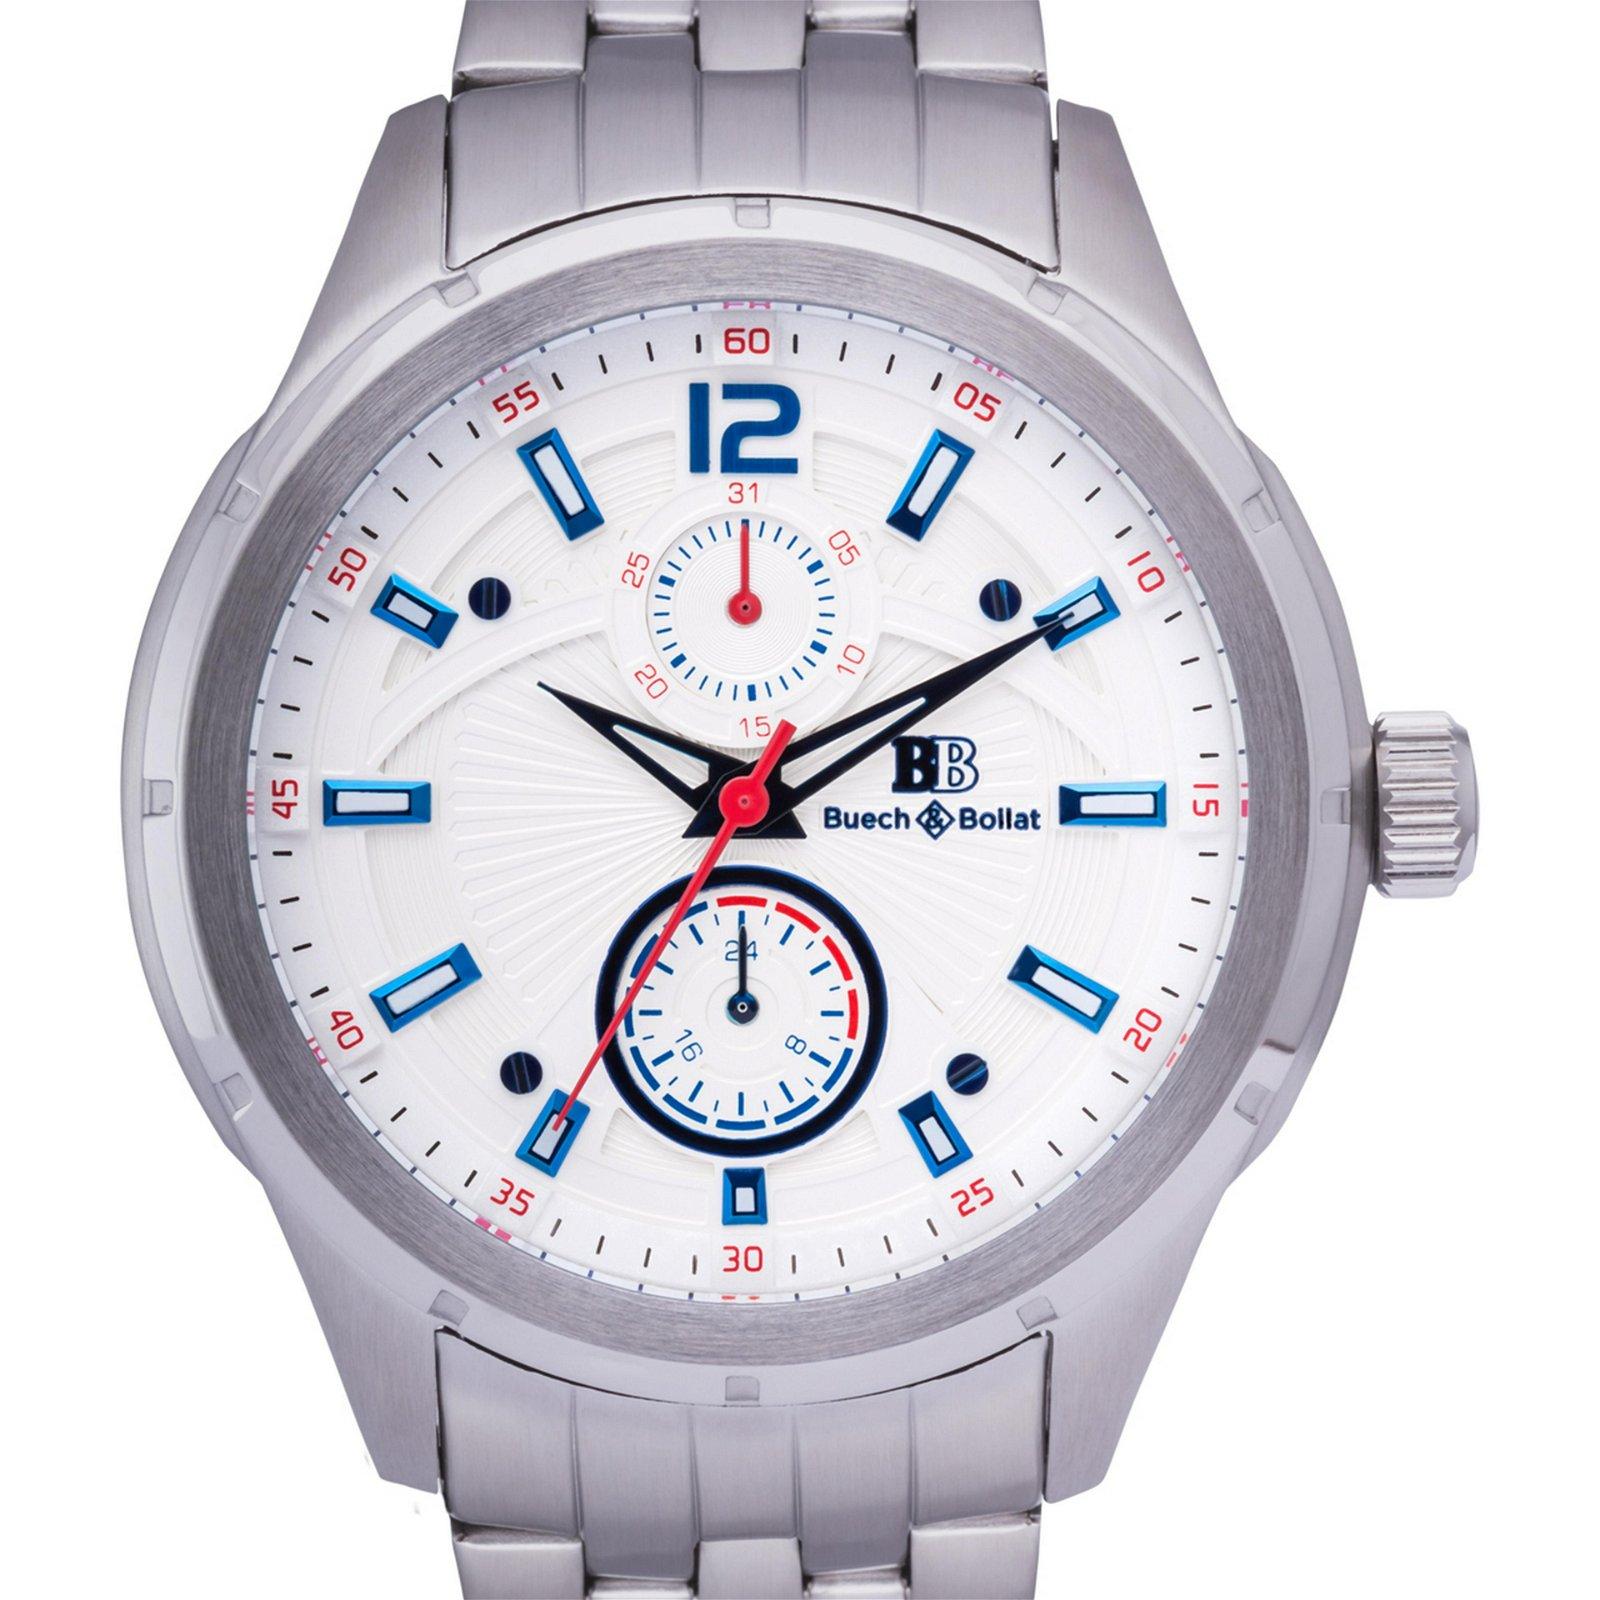 Buech & Boilat Courer Men's Quartz Watch Dial